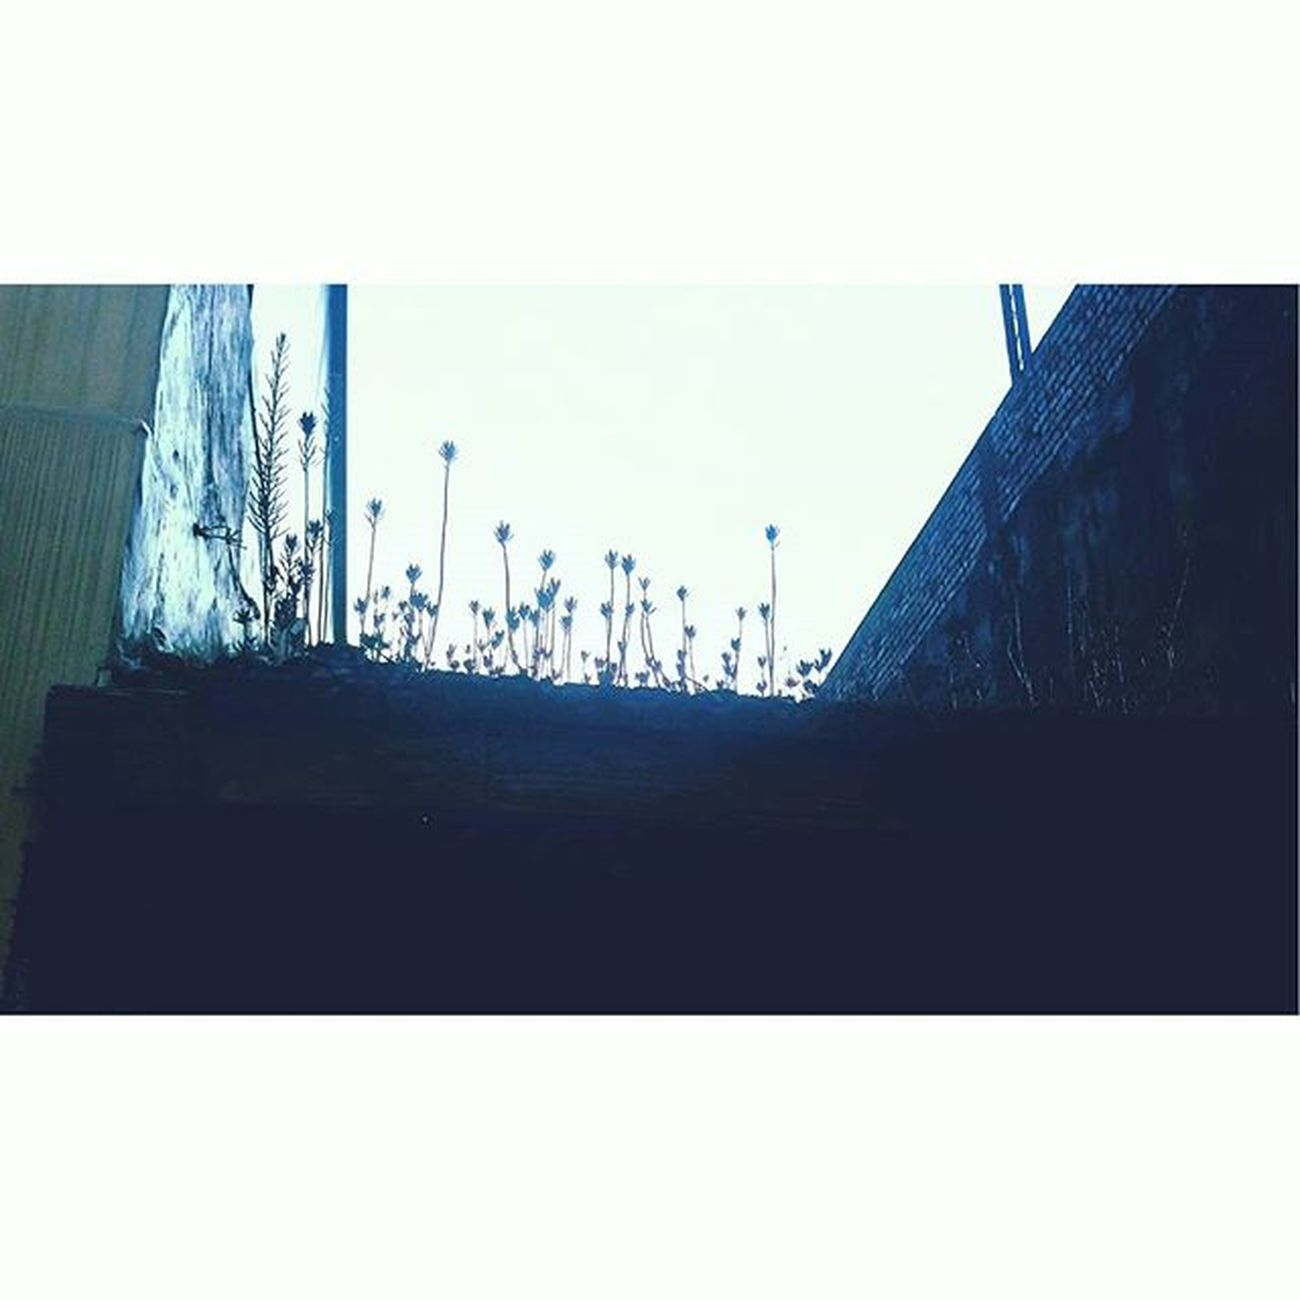 草 很高嘛 🌱 Grass Sunshin Roof Blue 屋頂 草 抬頭看